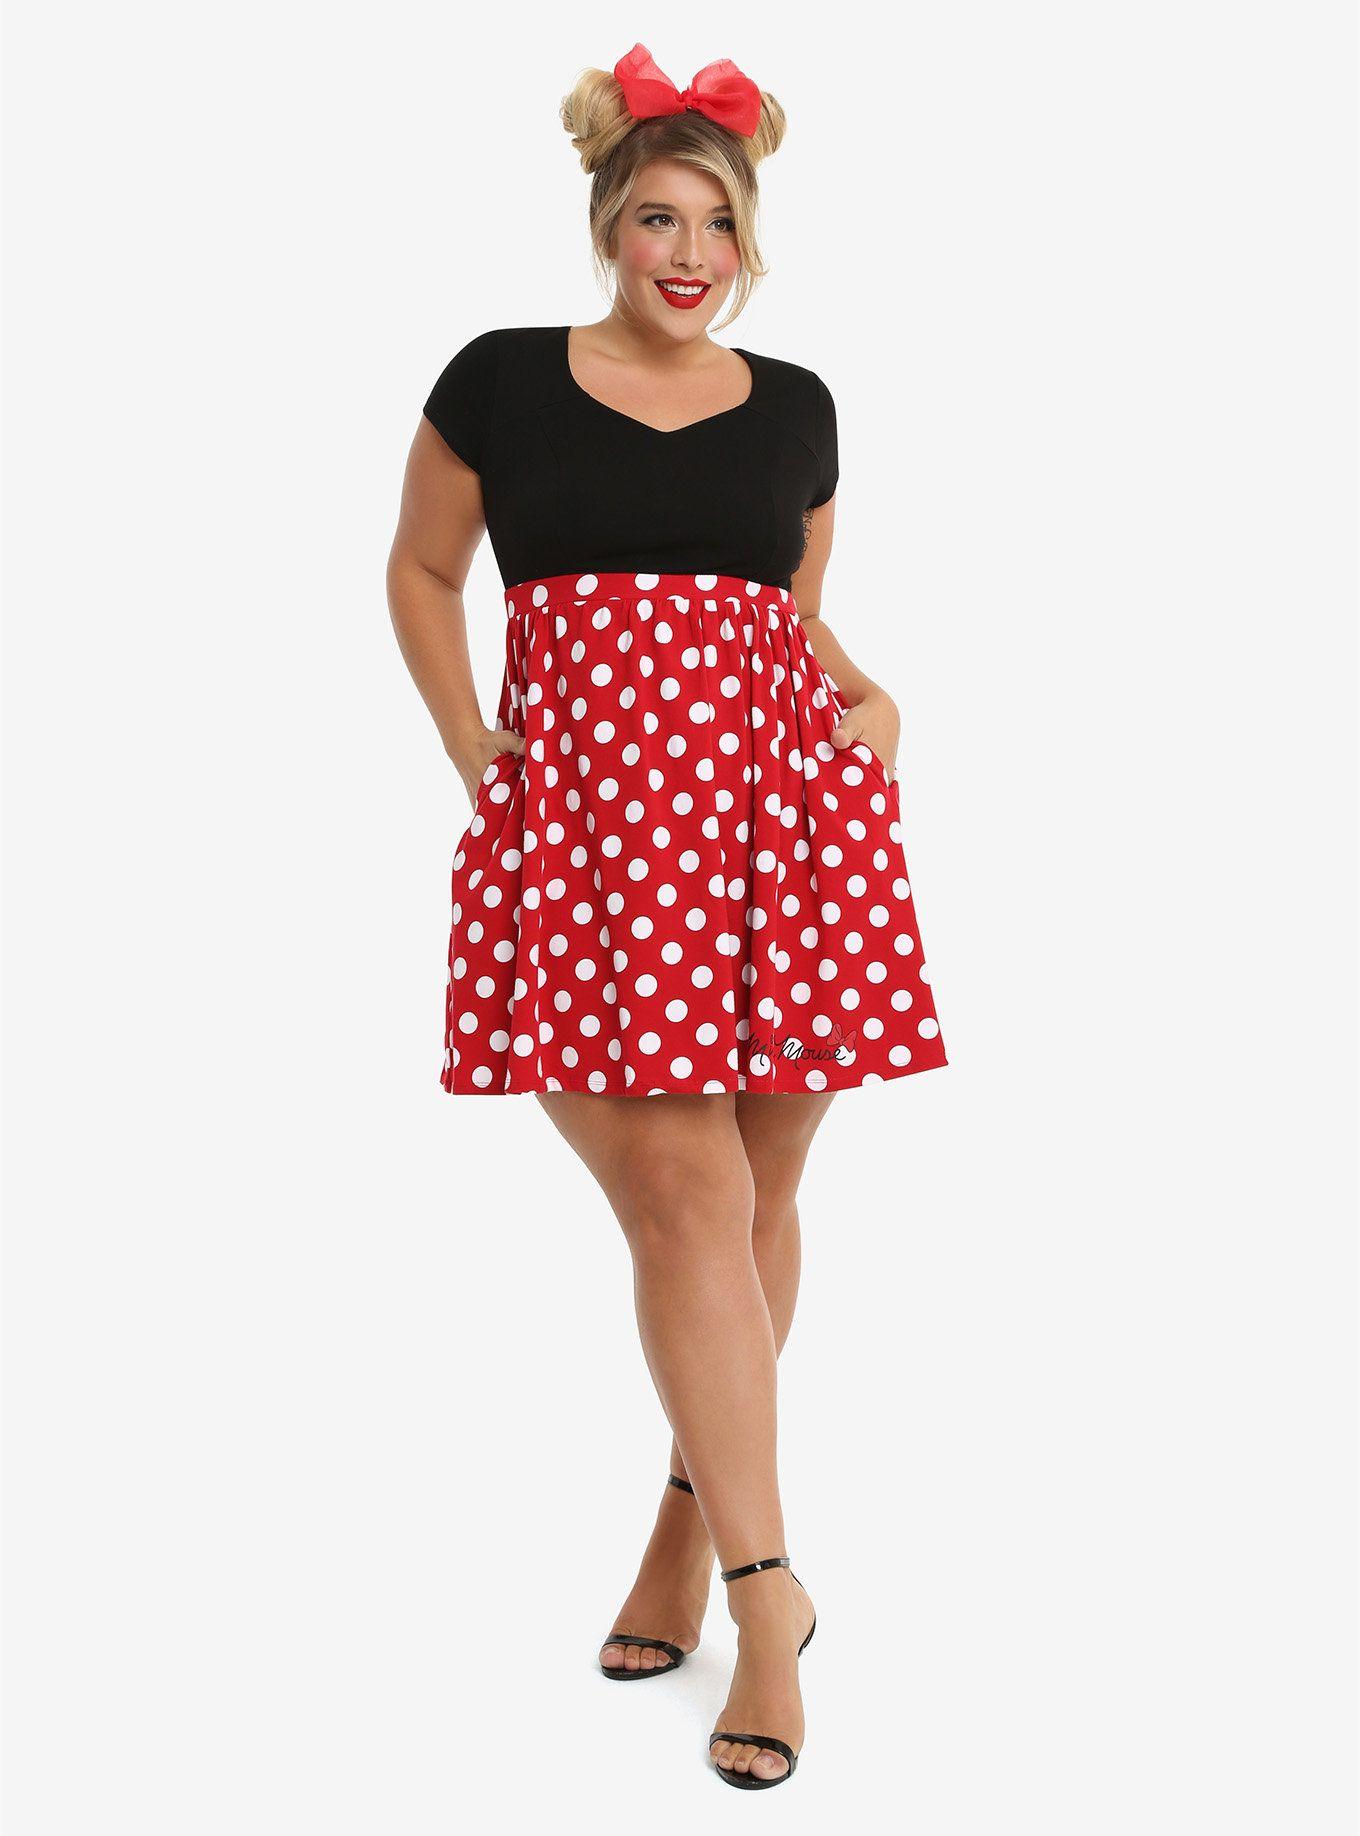 Disney minnie mouse polka dot dress plus size plus size